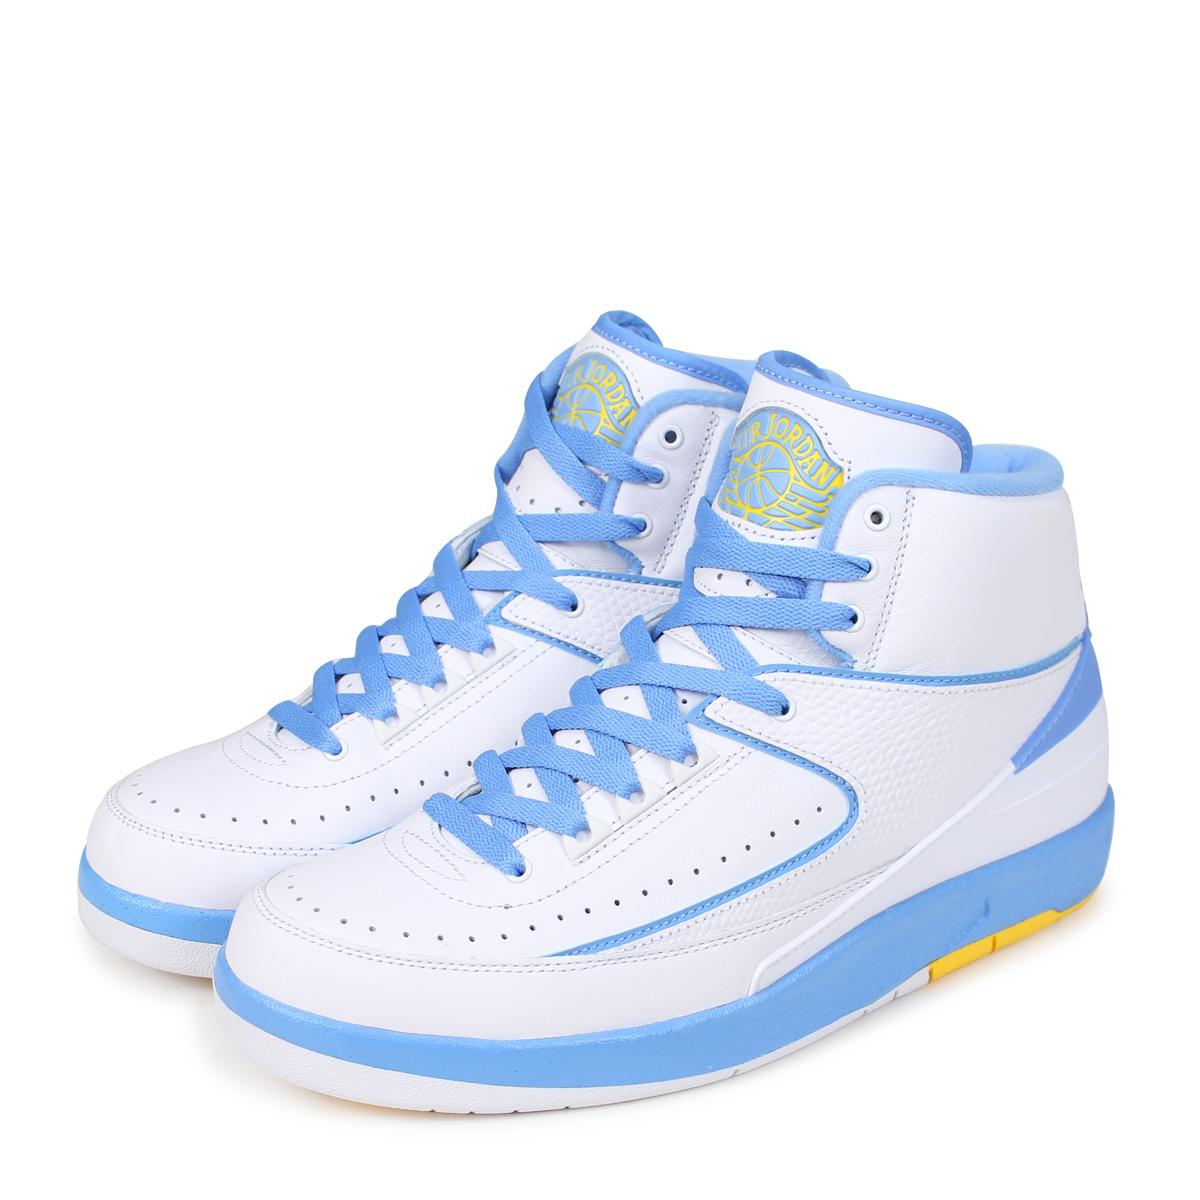 45938f6aa50 NIKE AIR JORDAN 2 RETRO MELO Nike Air Jordan 2 nostalgic sneakers men  385,475-122 ...